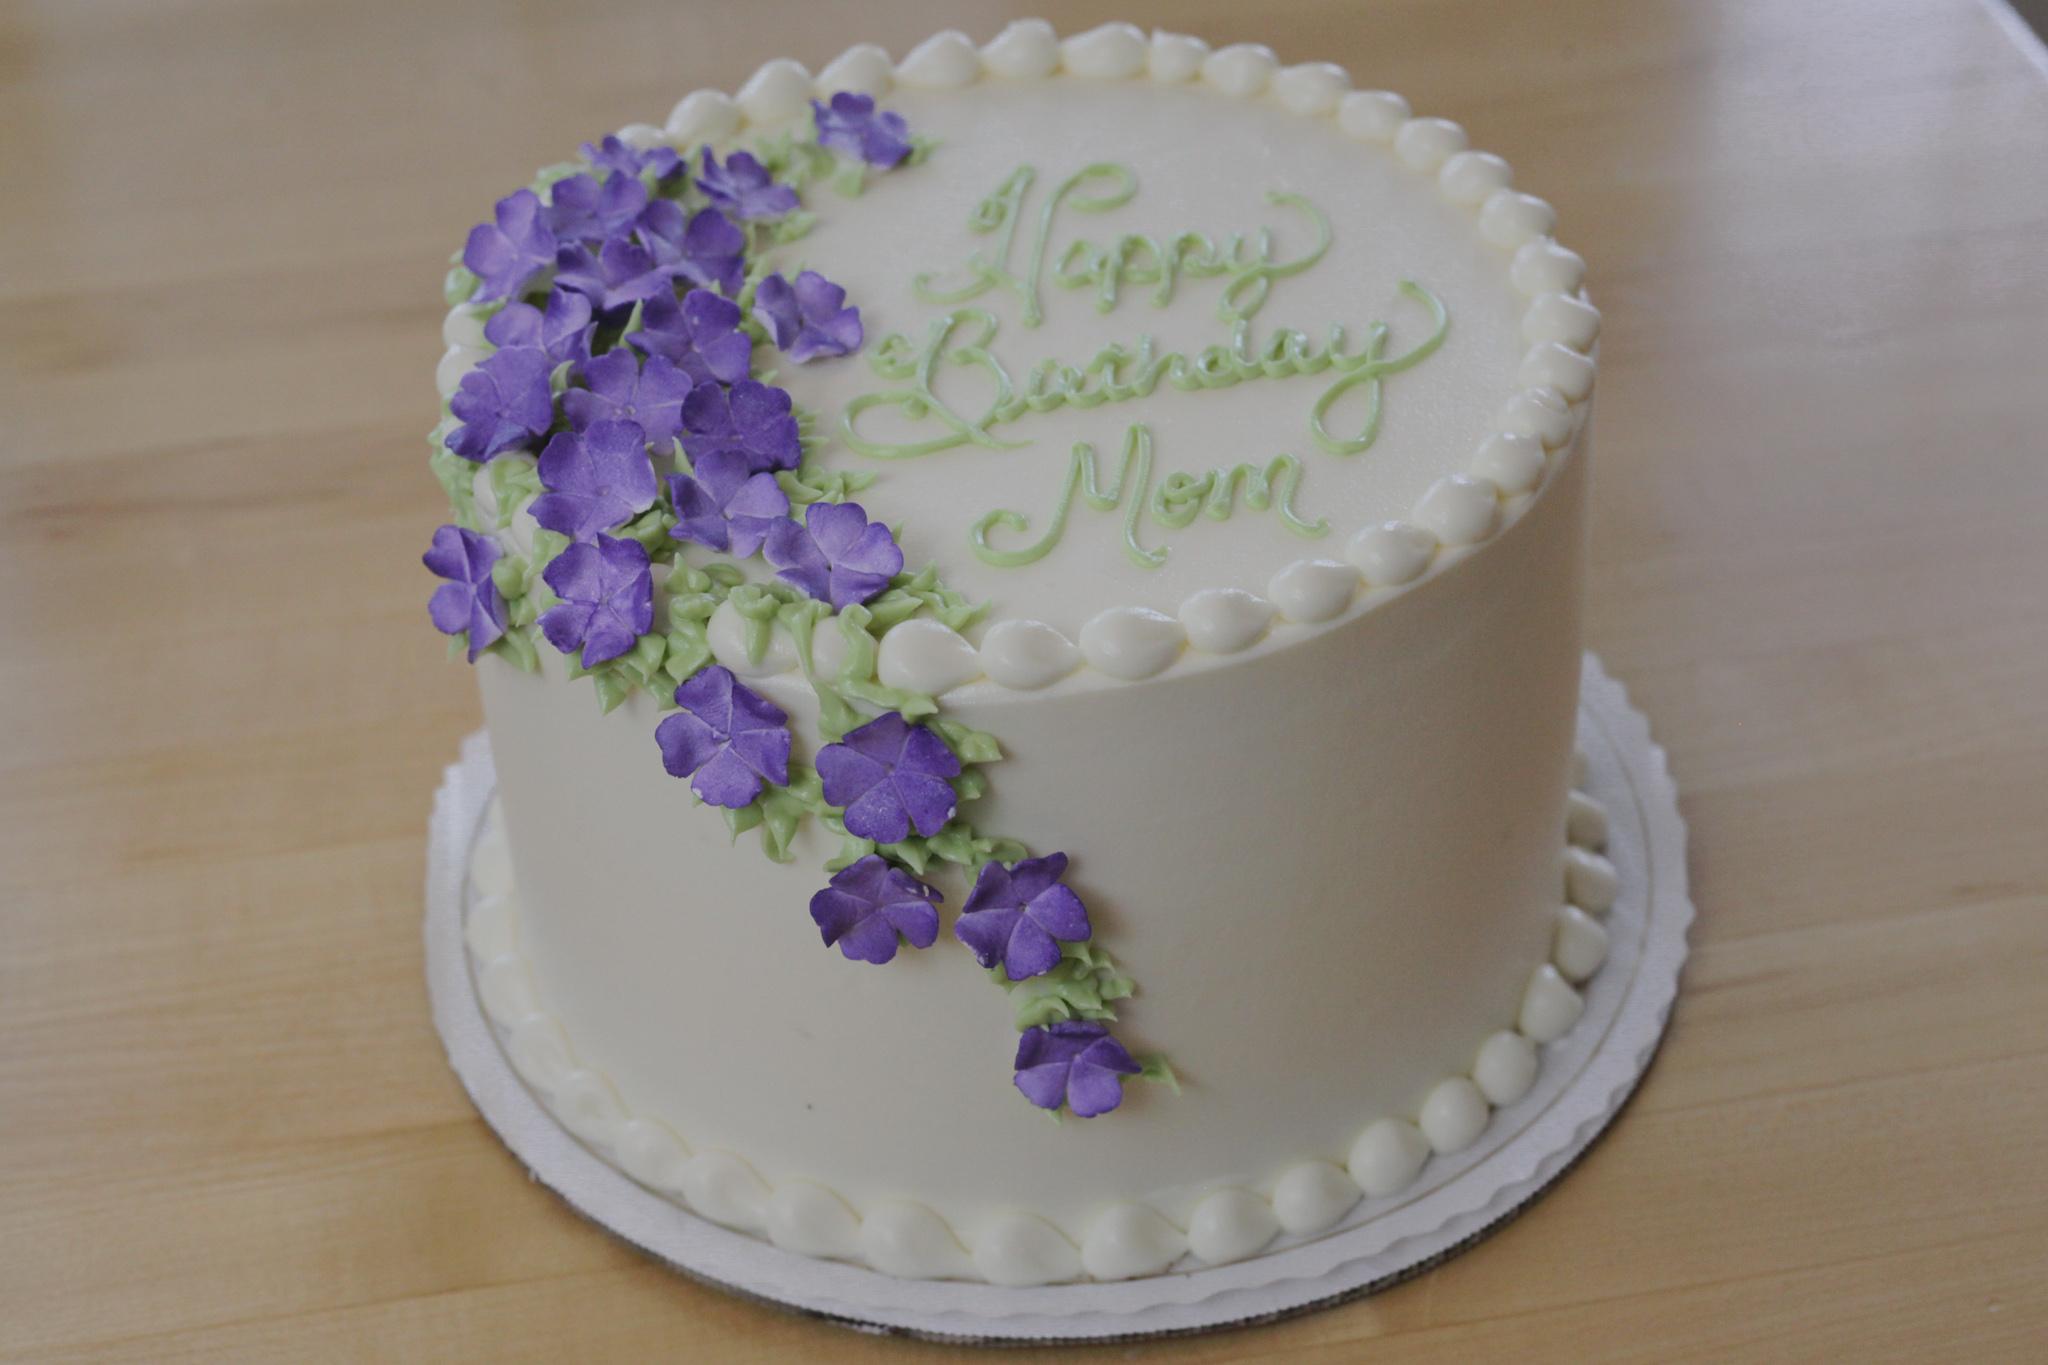 Happy Birthday Cake for Mom!